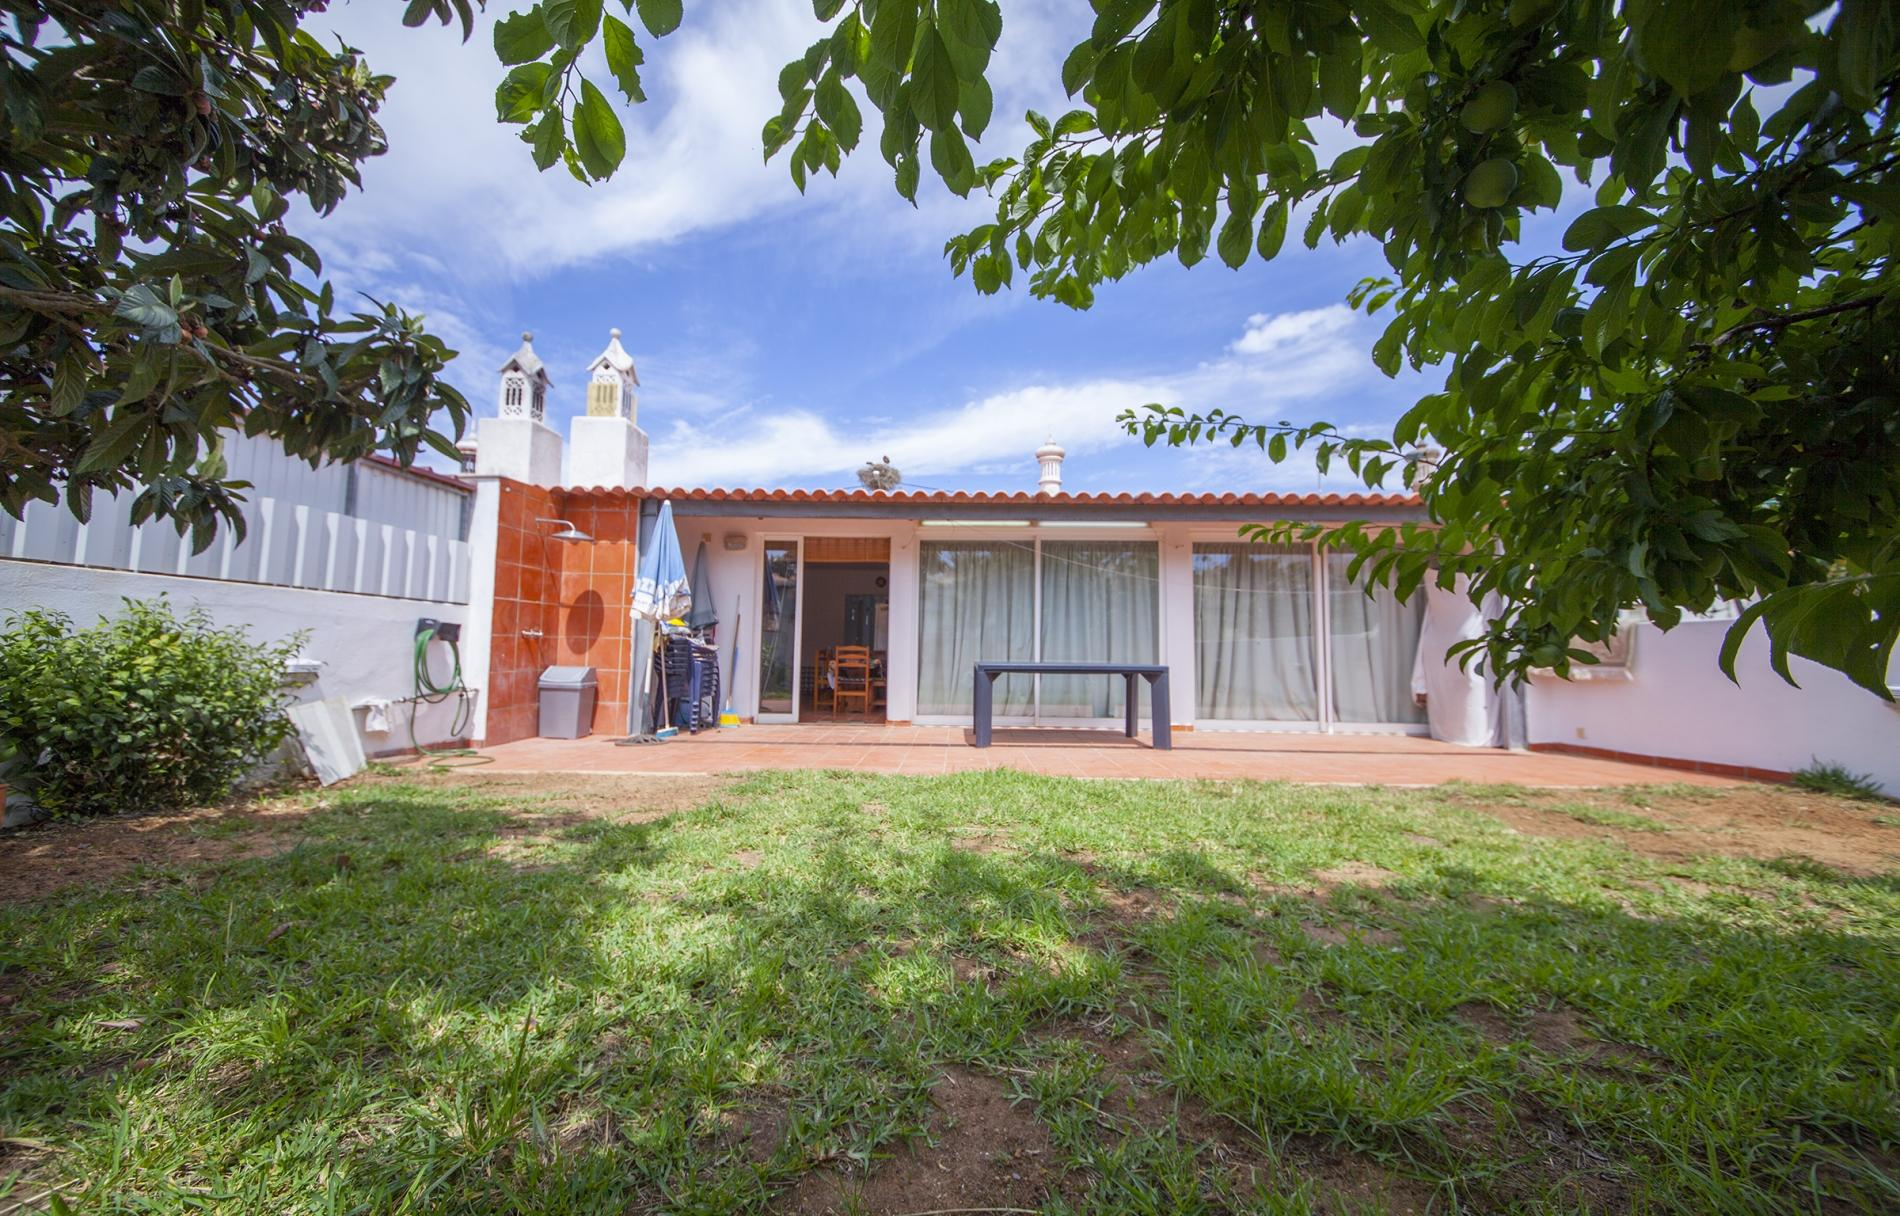 D10 - Ferragudo Townhouse photo 20354877